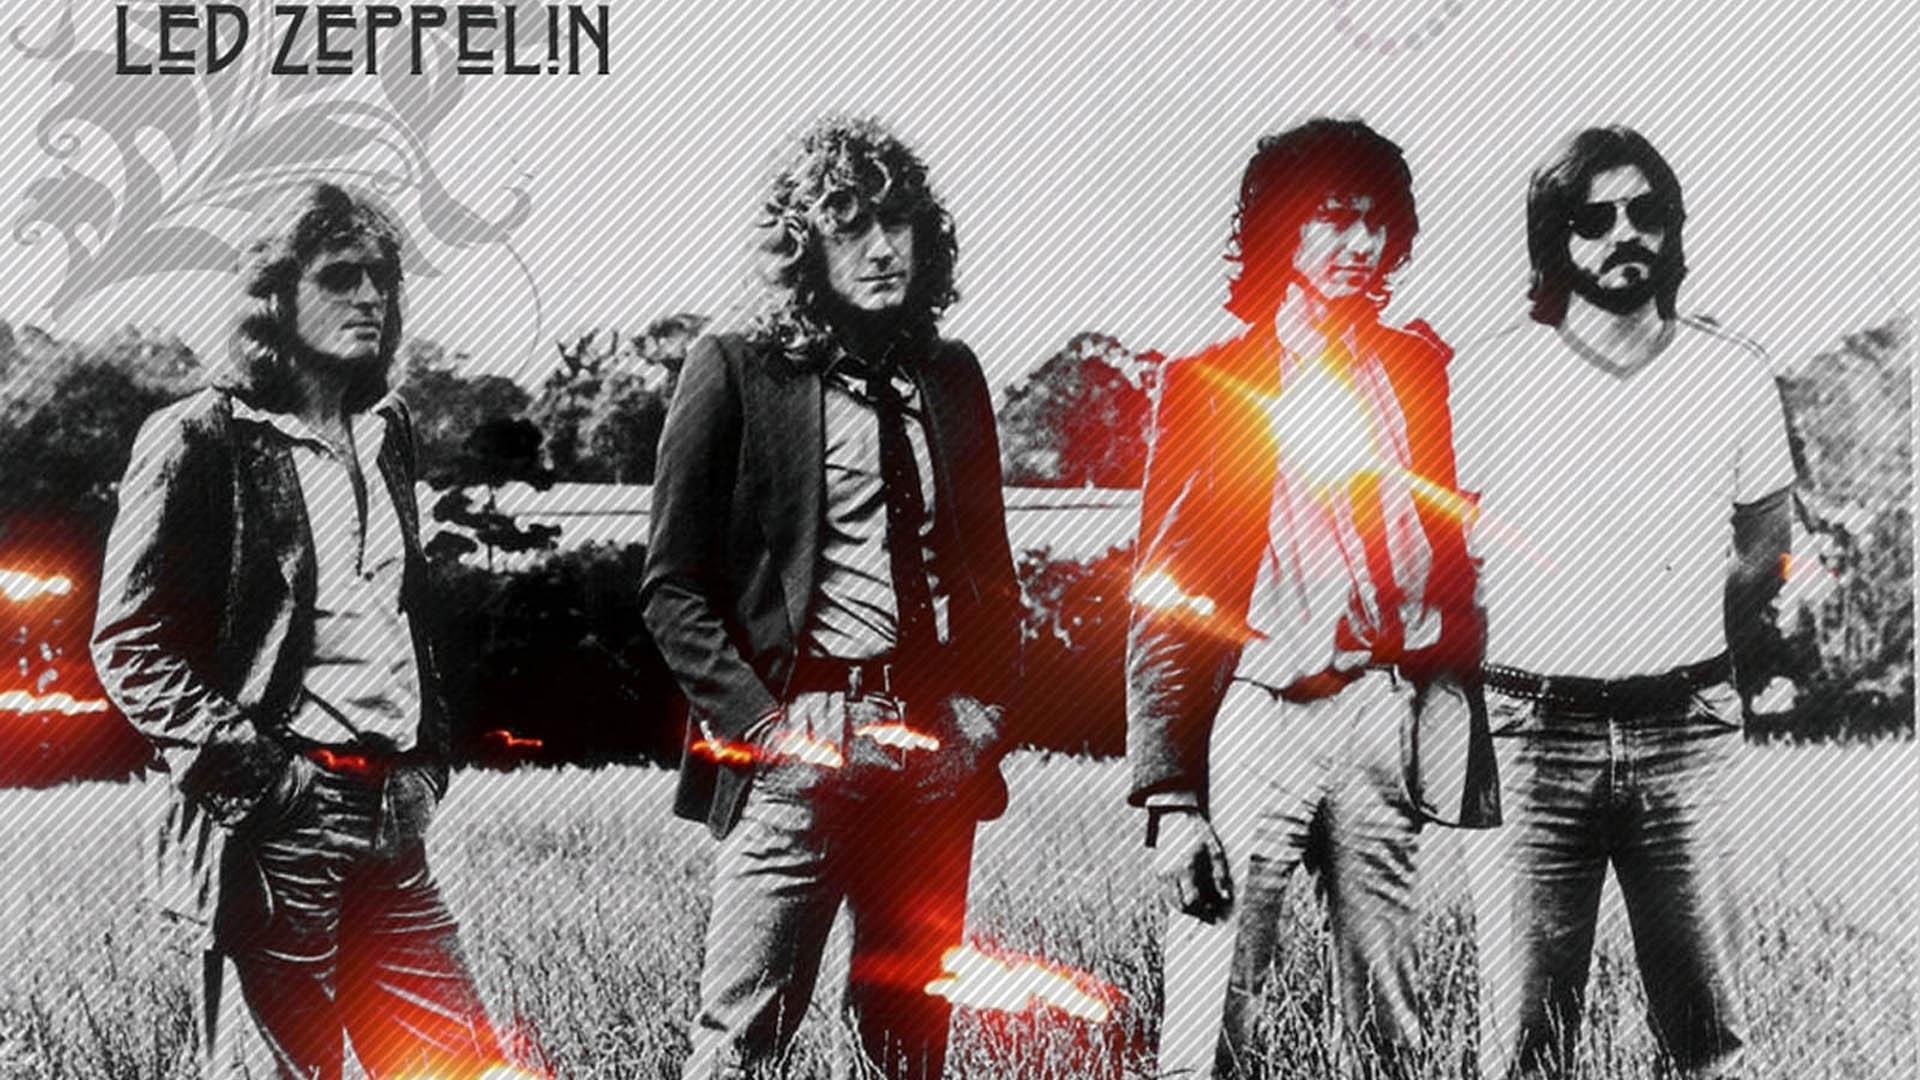 [46+] Led Zeppelin Wallpaper Desktop on WallpaperSafari